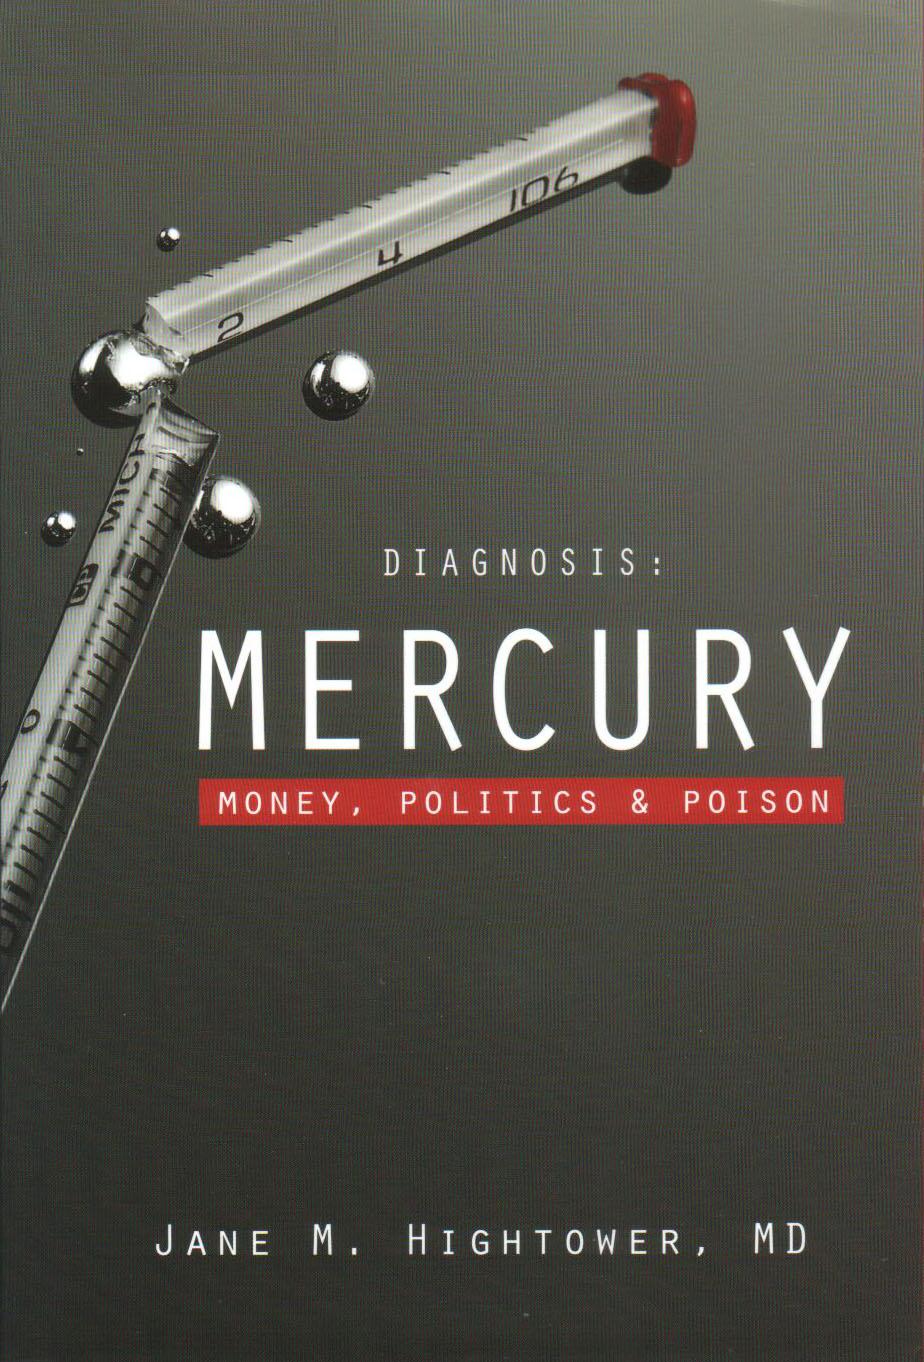 Diagnosis: Mercury – Money, Politics, and Poison